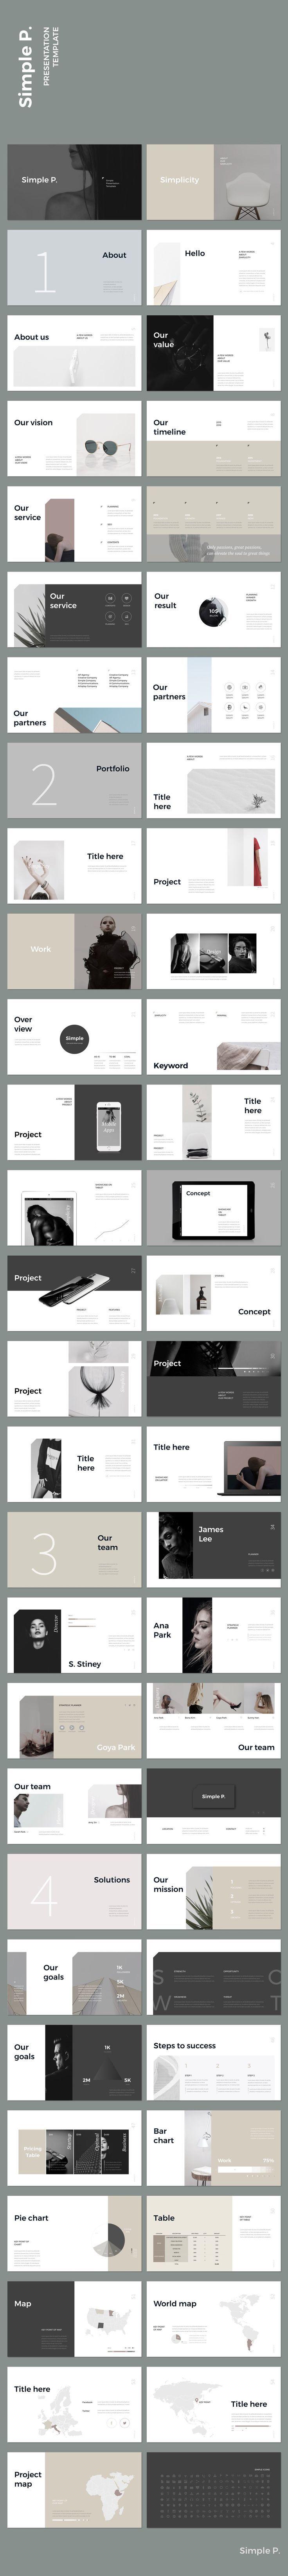 Simple & Minimal #keynote #presentation #simple #minimal #portfolio #business #marketing